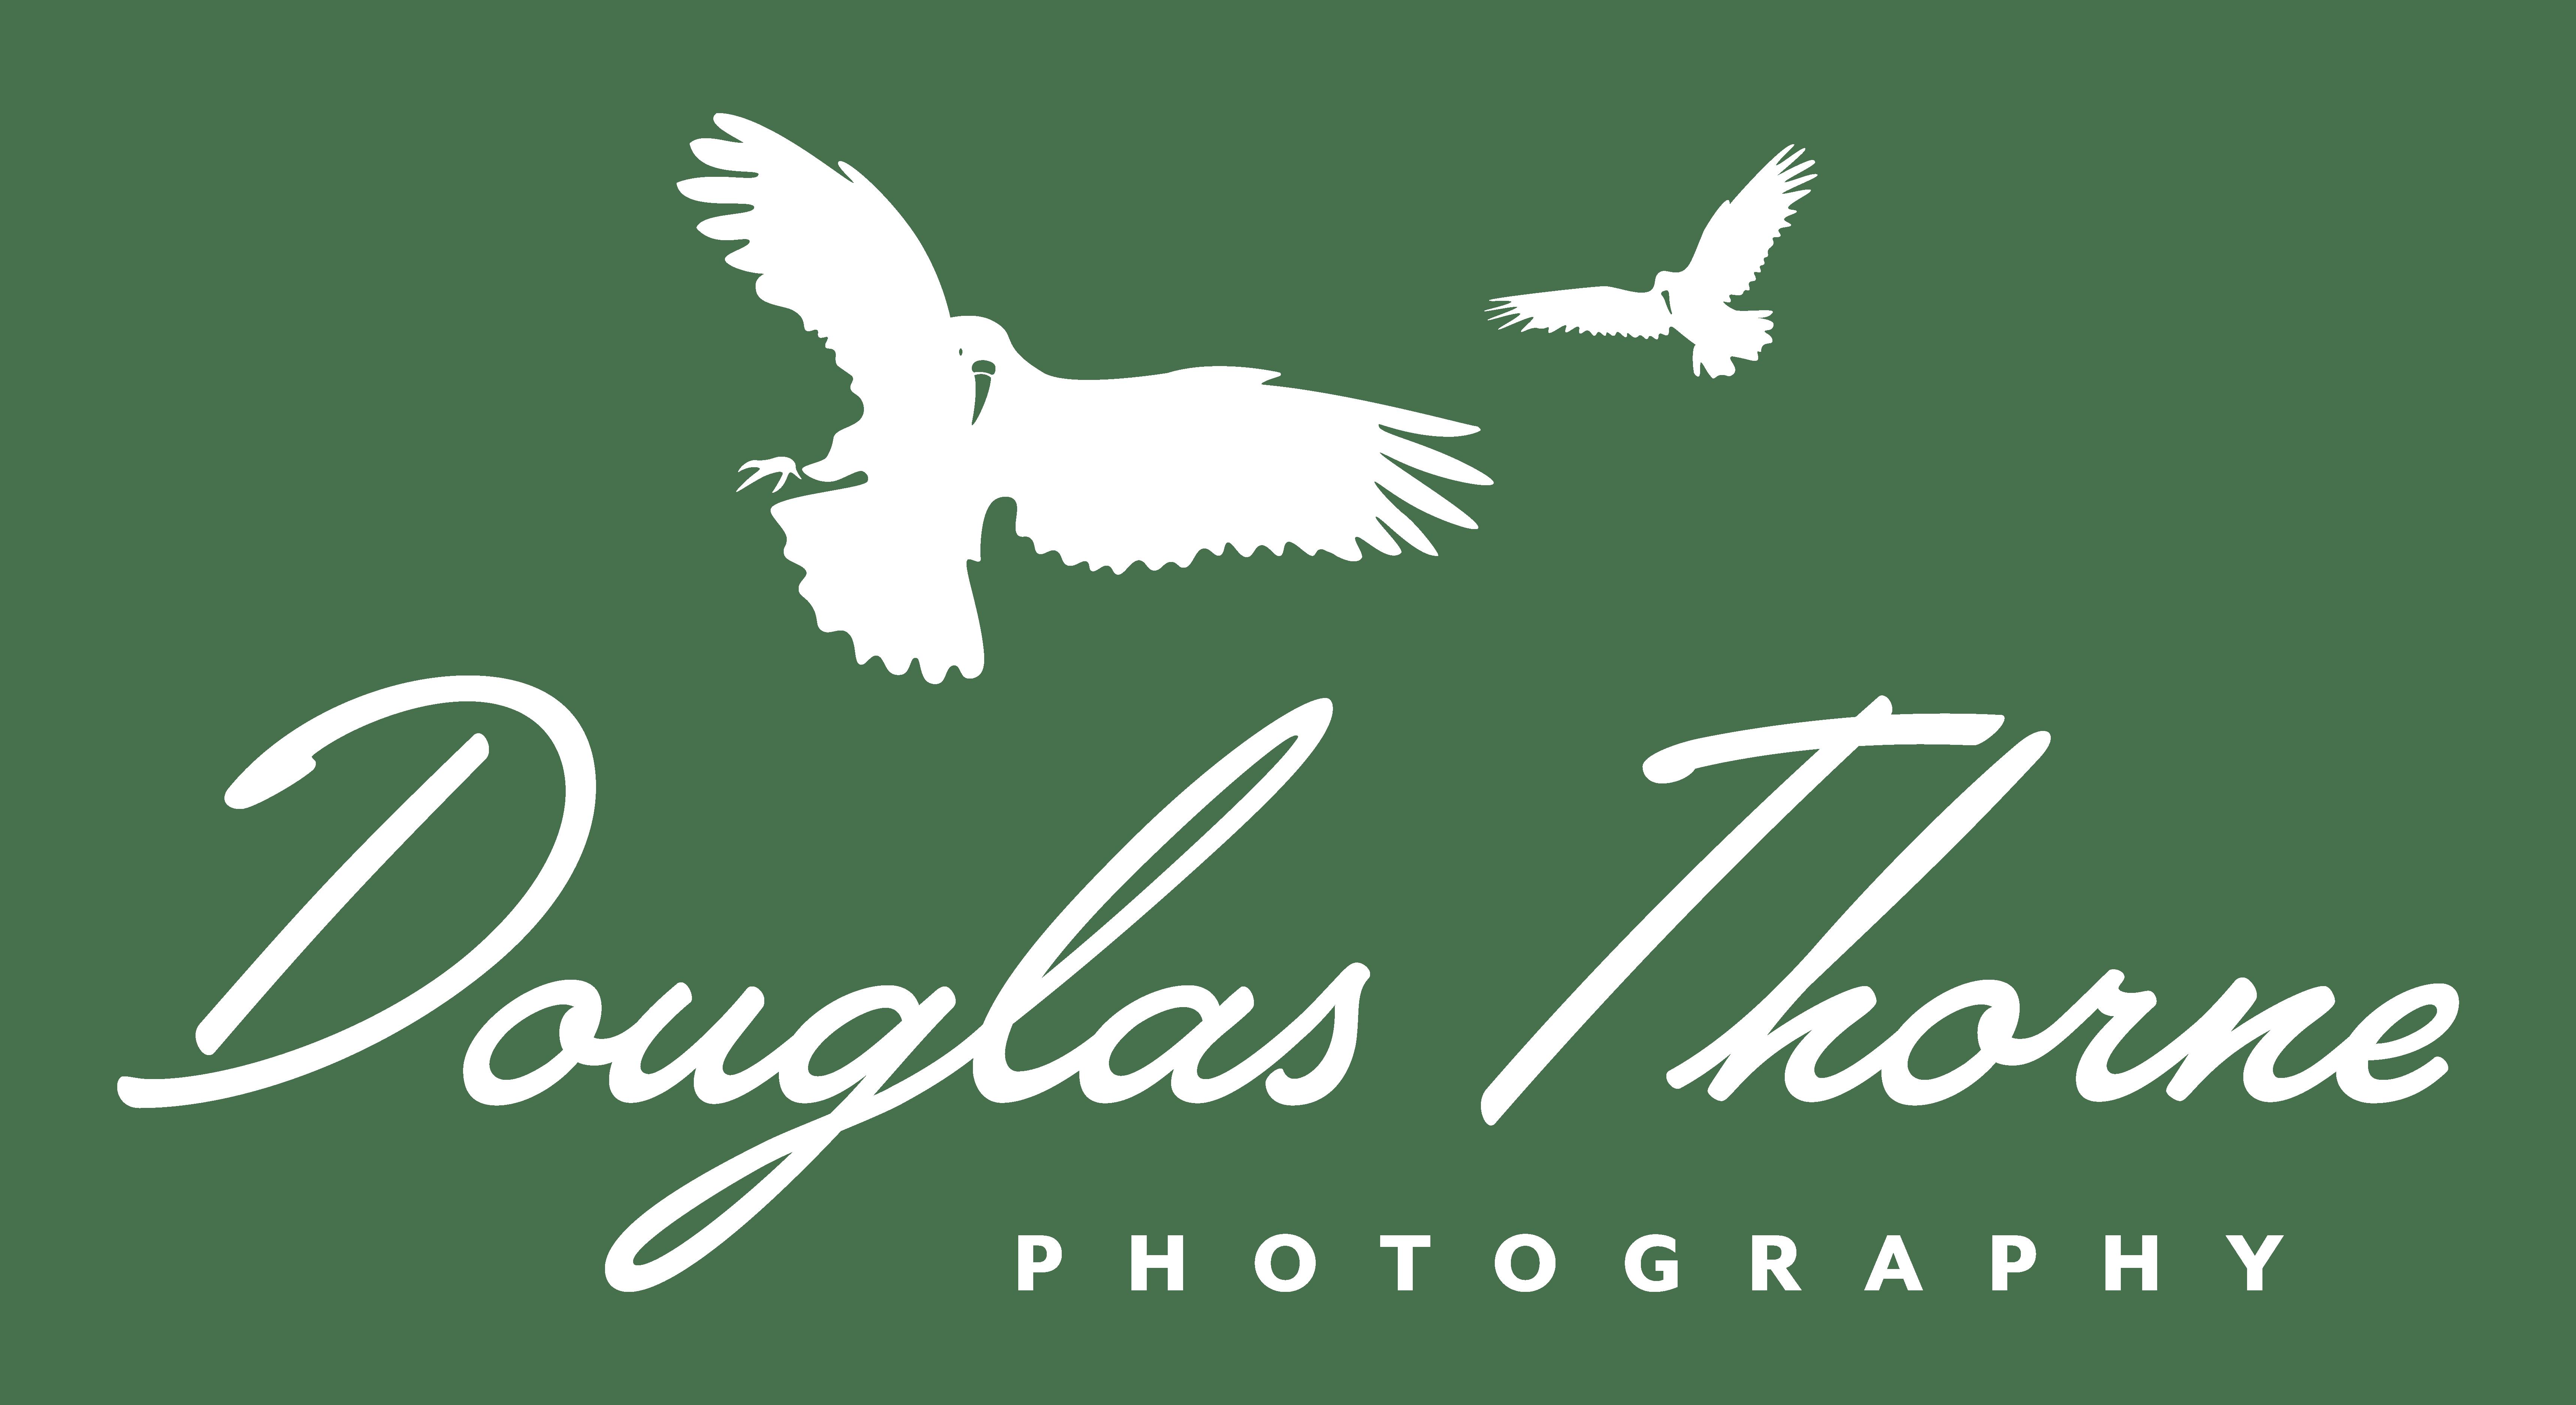 Douglas Thorne Photography